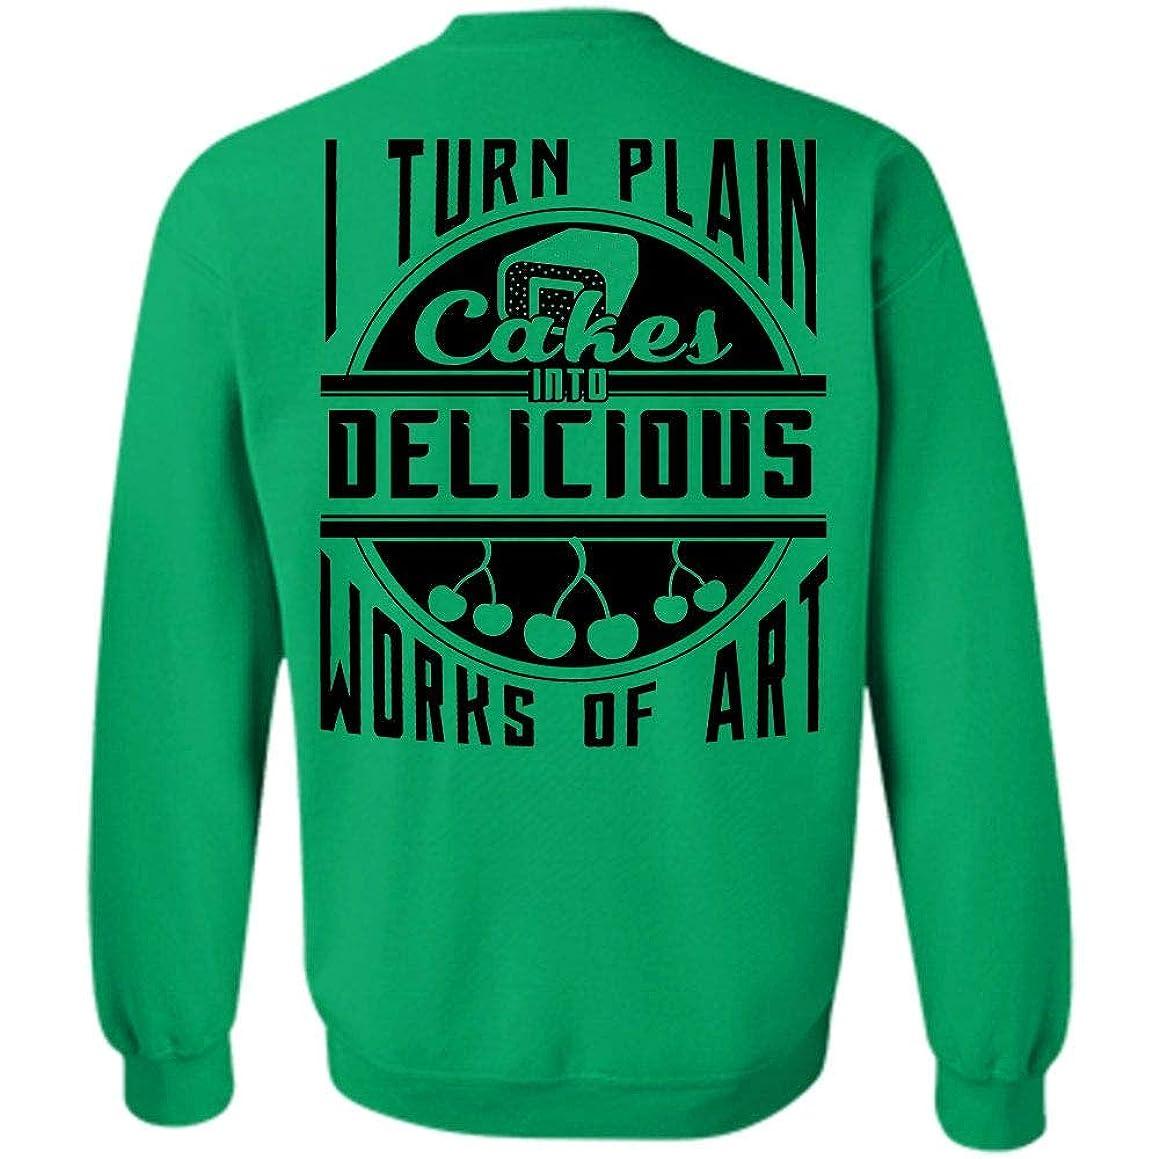 My Job T Shirt, I Turn Plain Cakes Into Delicious Works of Art Sweatshirt